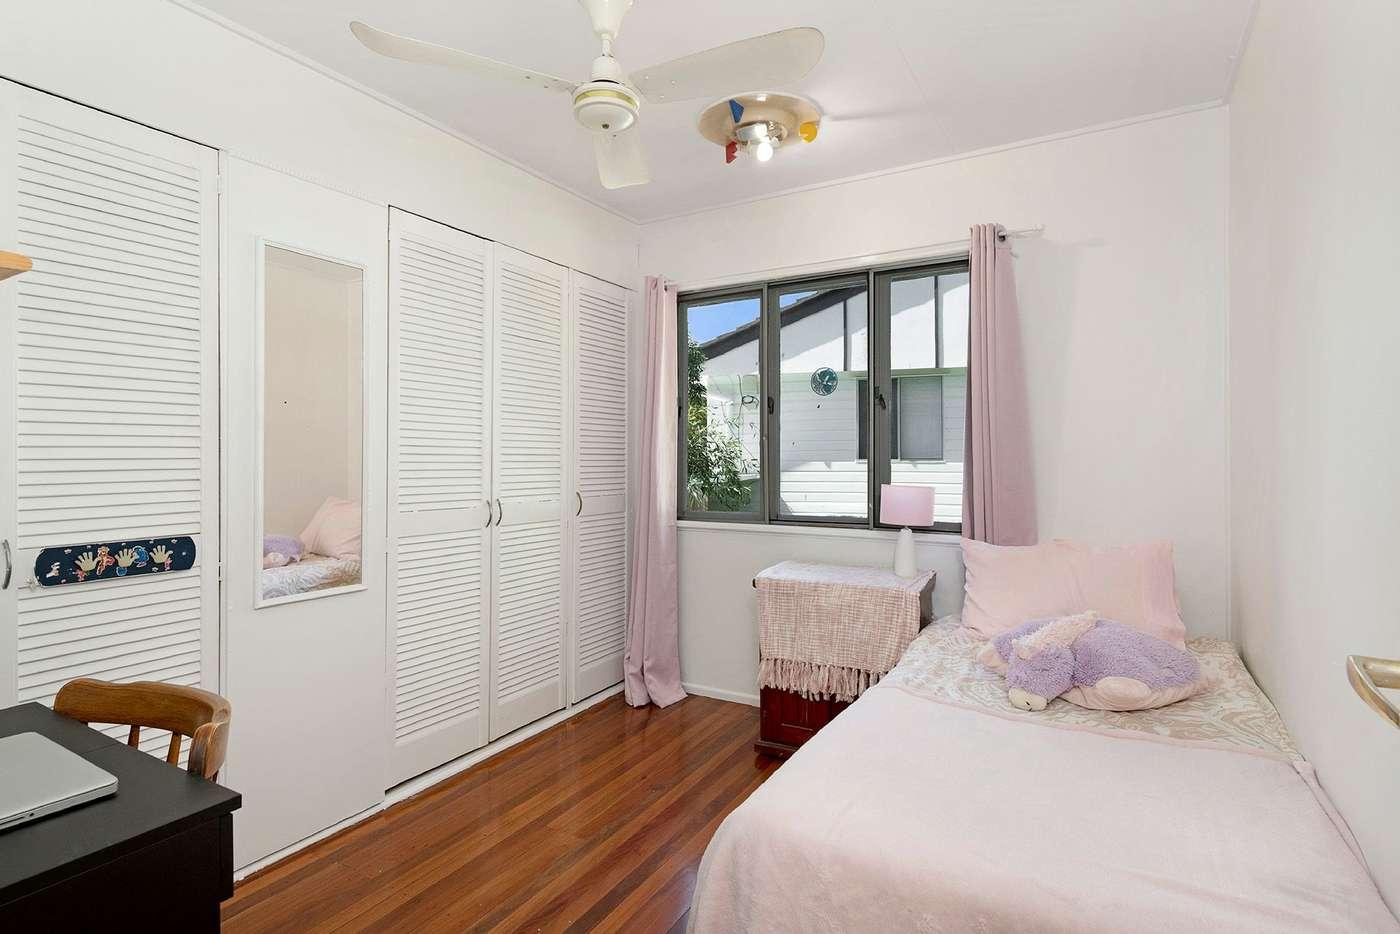 Seventh view of Homely house listing, 42 Verbena Street, Mount Gravatt QLD 4122